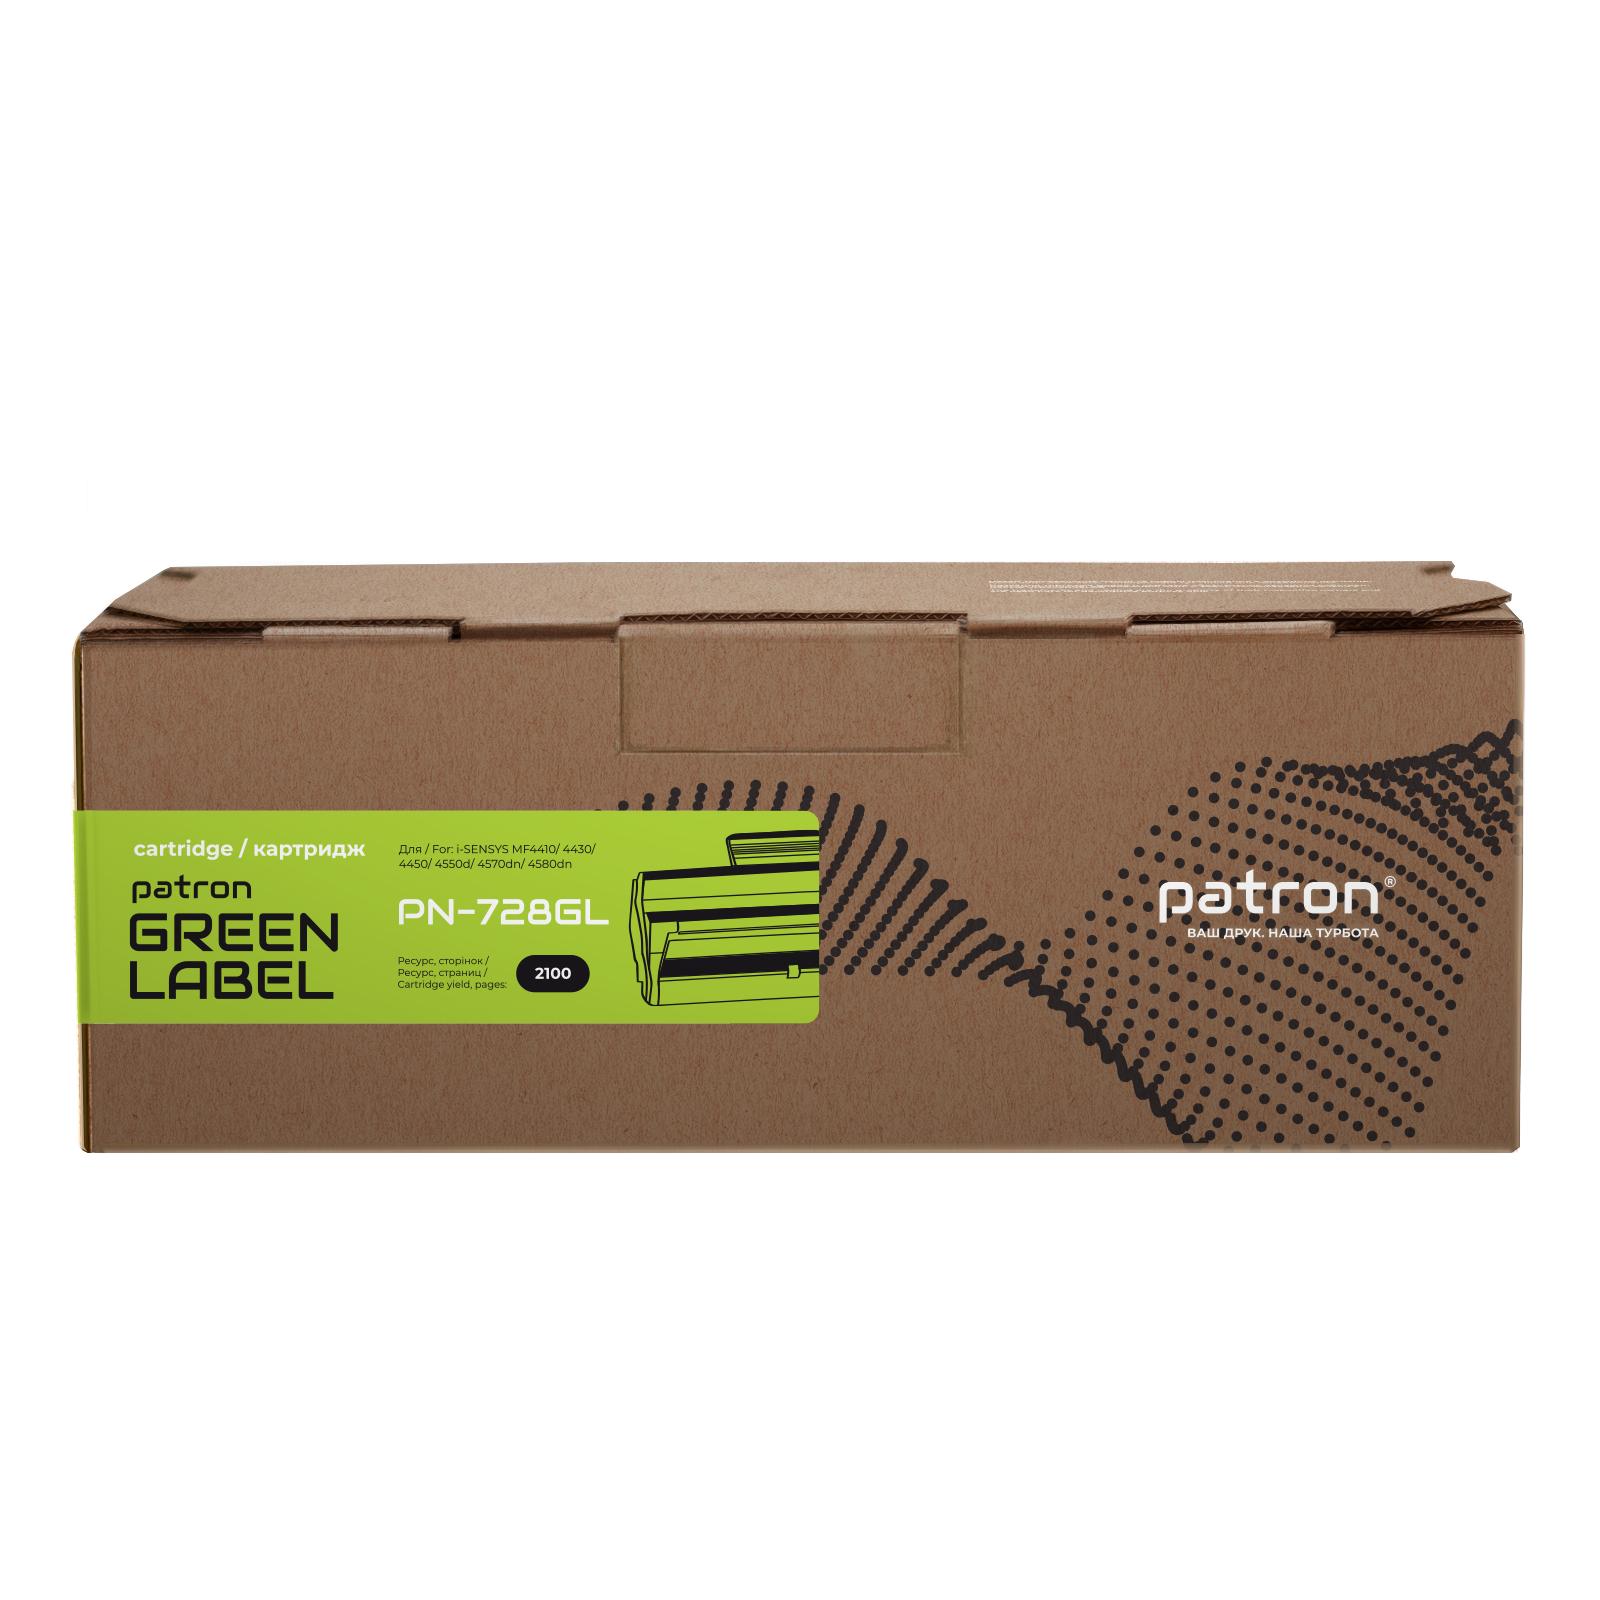 Картридж Patron CANON 728 GREEN Label (PN-728GL) изображение 2